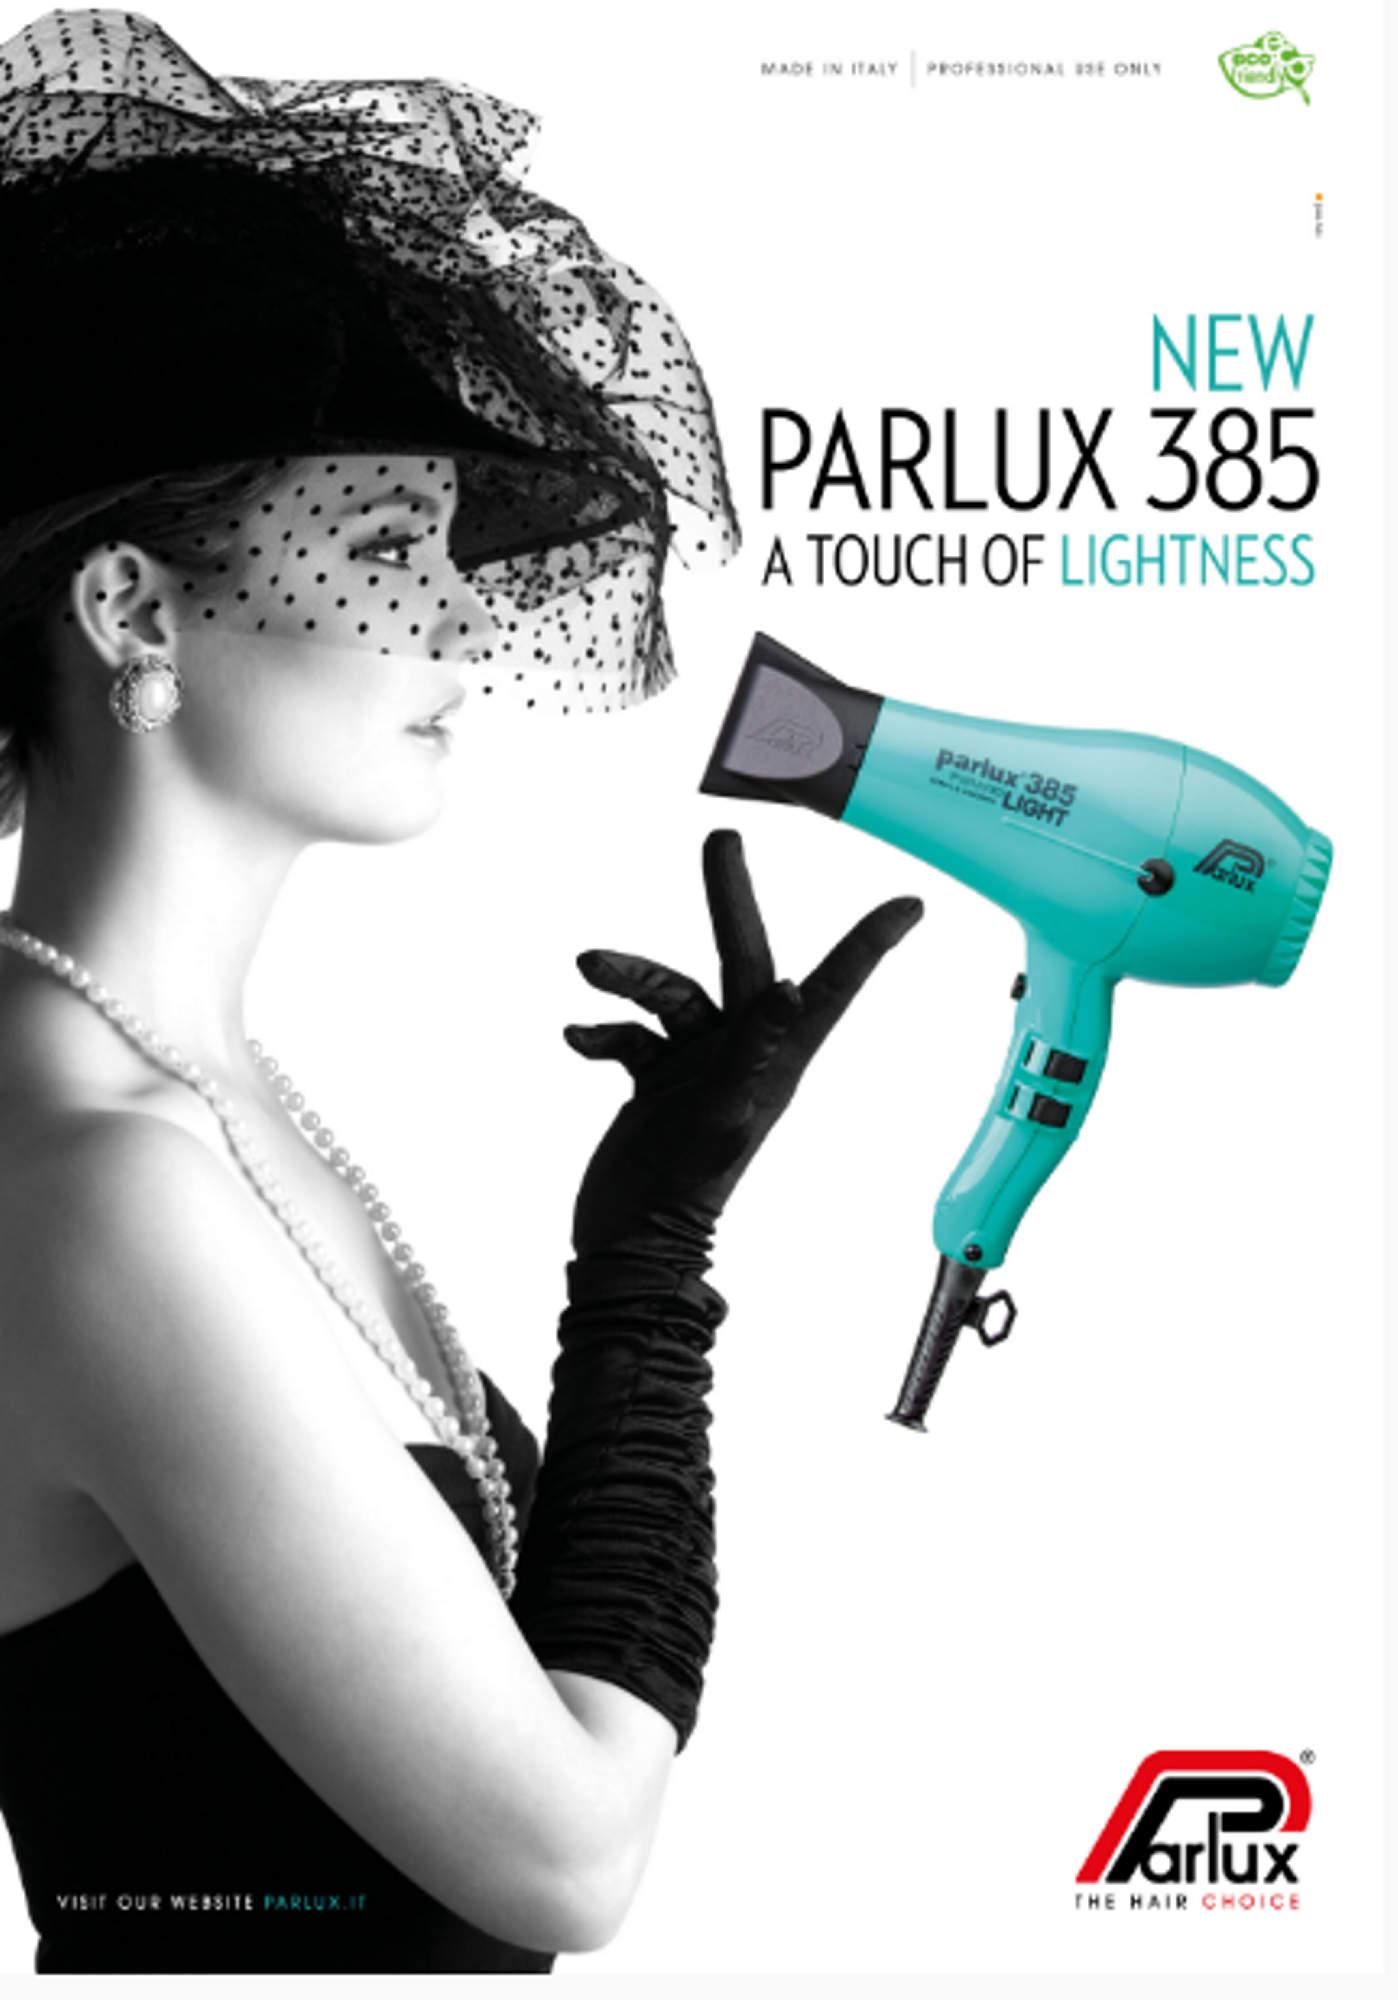 Campagna Parlux 2015